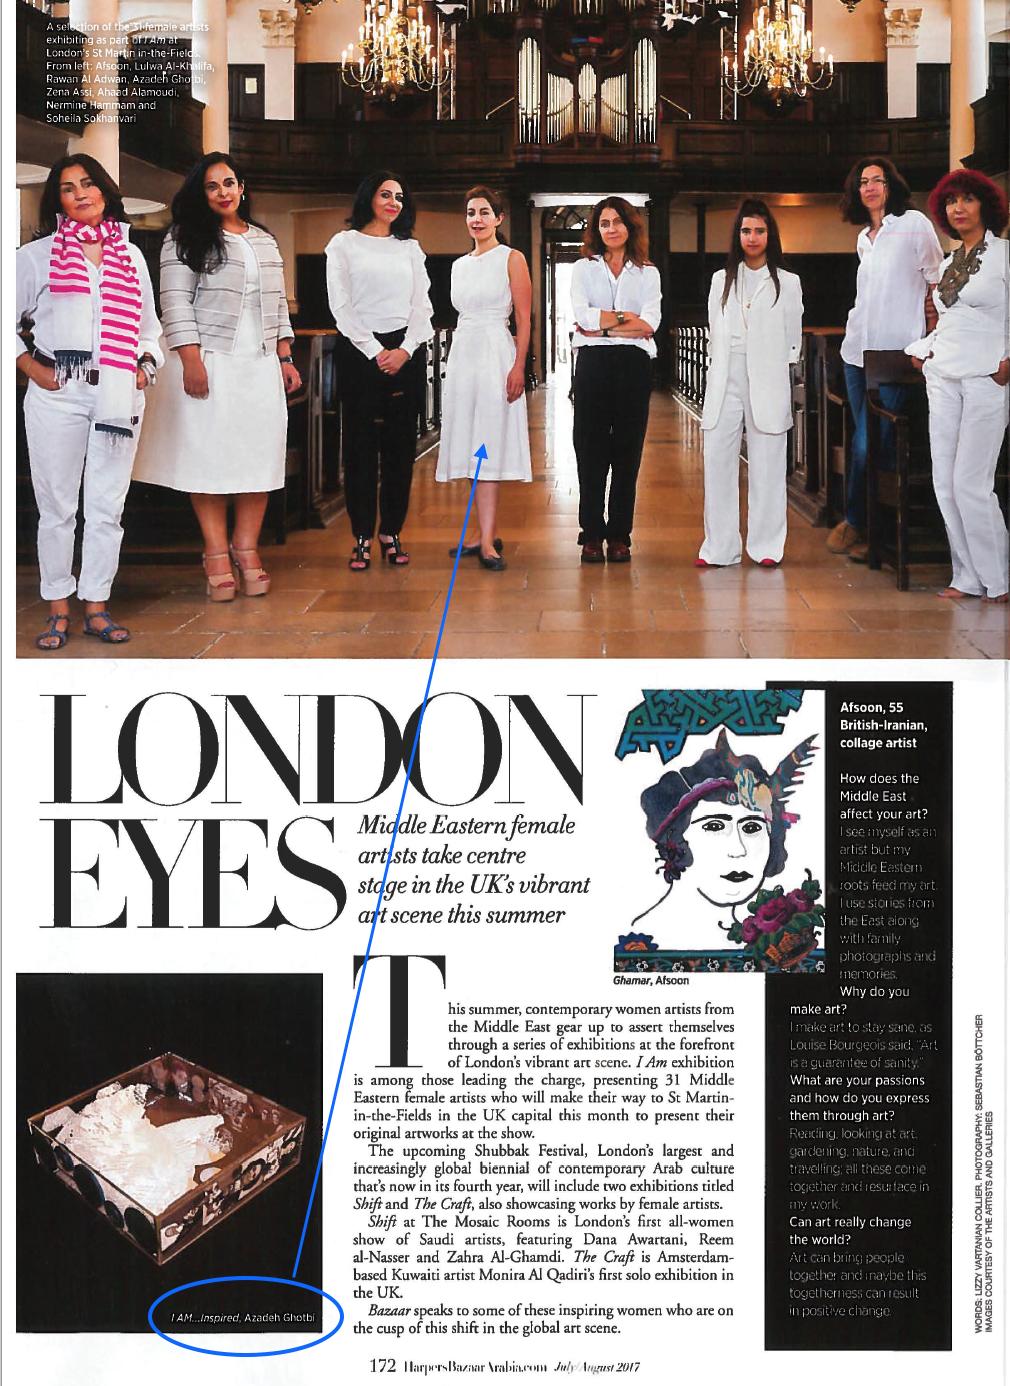 Link to article:  http://www.harpersbazaararabia.com/art/exhibitions/female-artists-showing-in-london